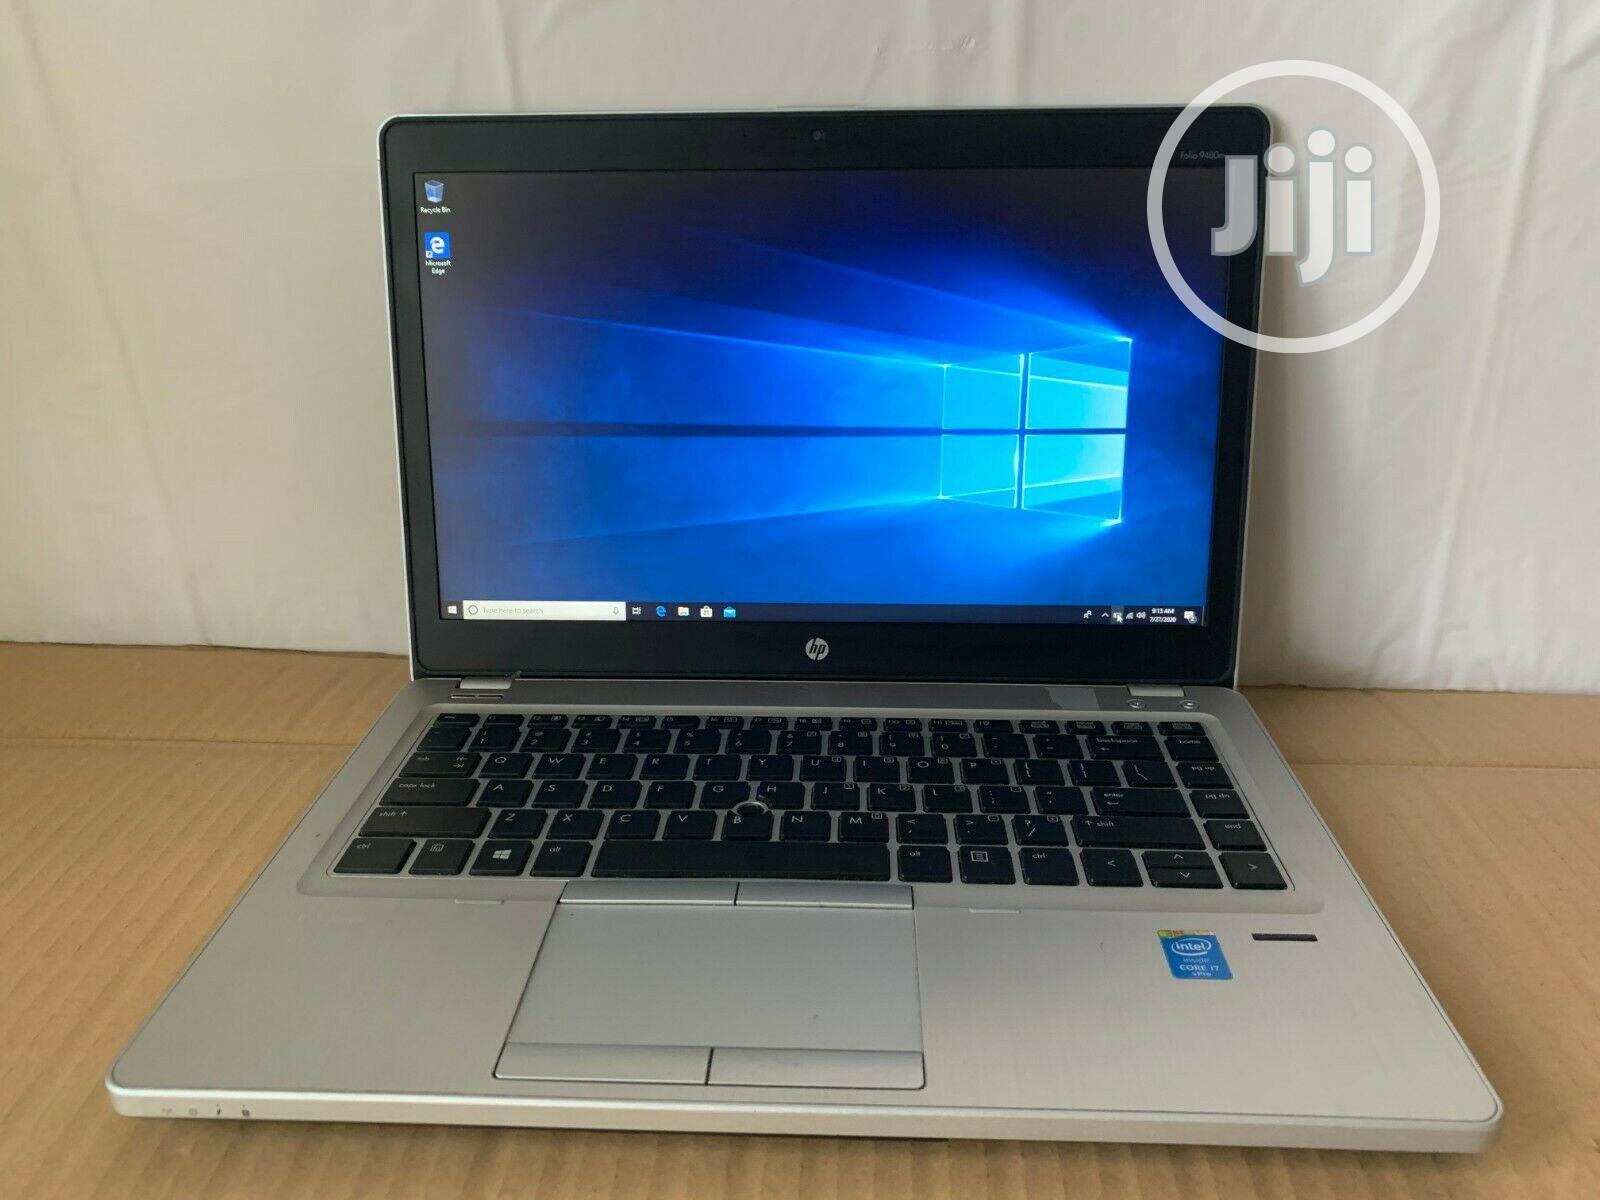 Laptop HP EliteBook Folio 9480M 4GB Intel Core I5 HDD 320GB | Laptops & Computers for sale in Gwarinpa, Abuja (FCT) State, Nigeria